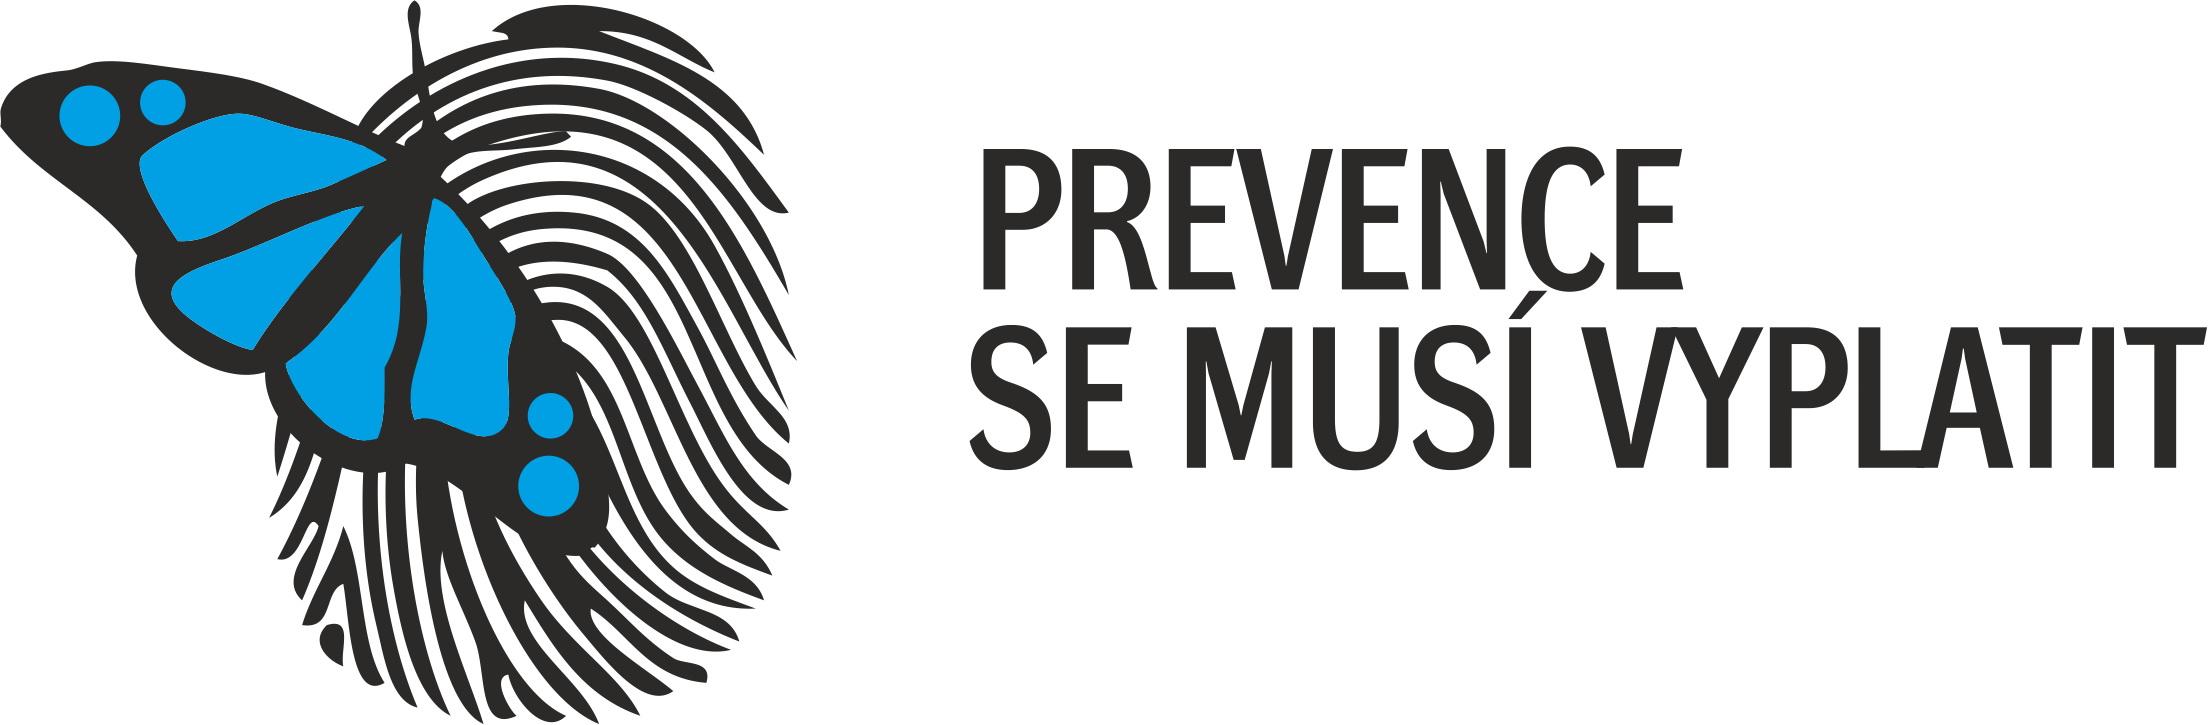 logo_prevencemvcr_2009.jpg